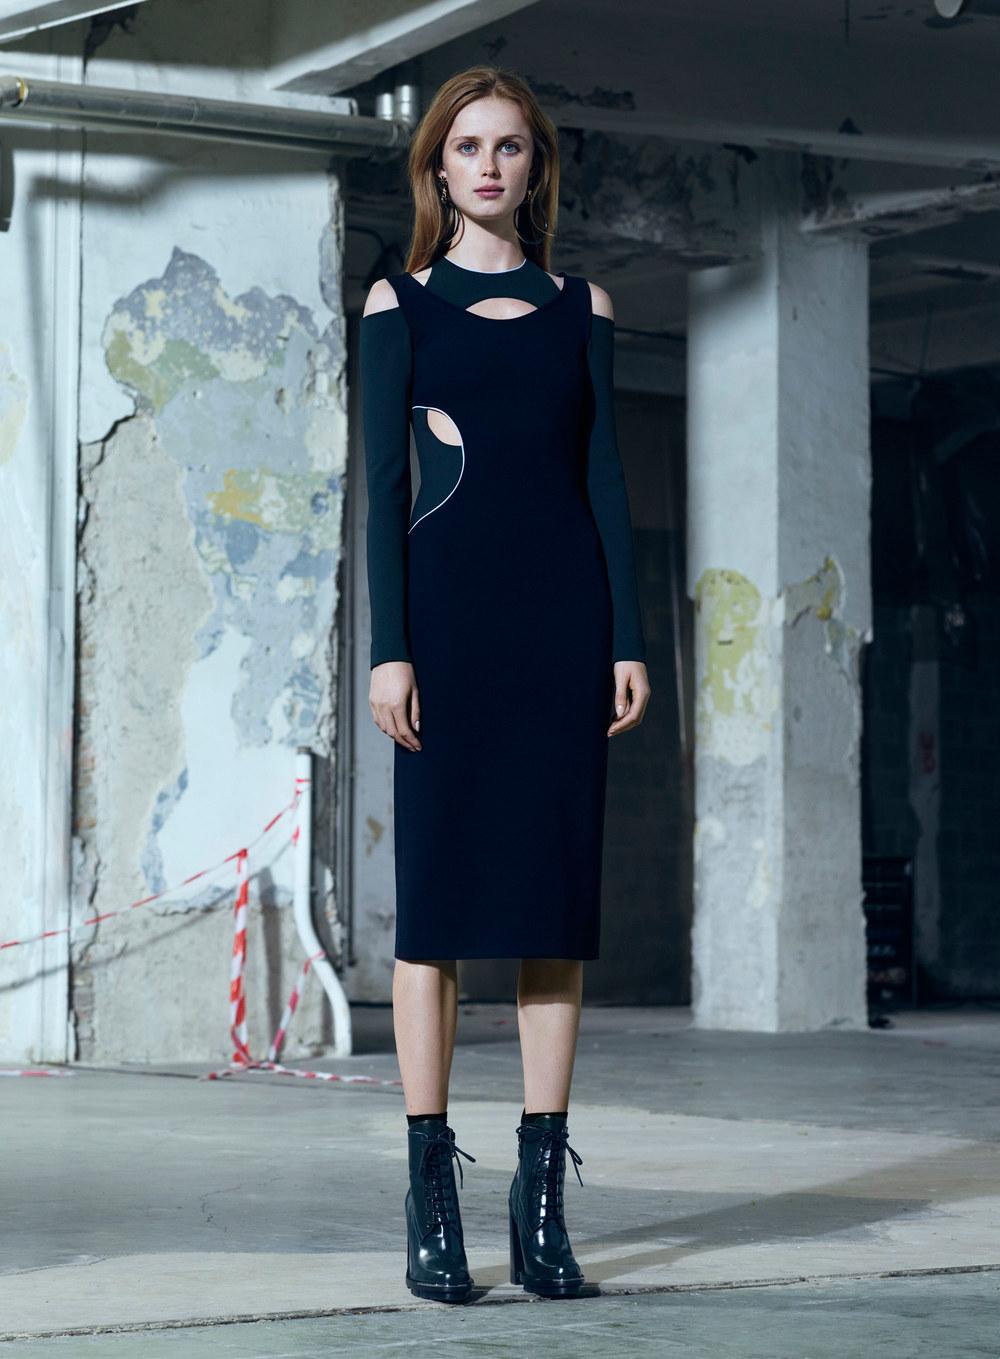 versace-pre-fall-2016-lookbook-11.jpg